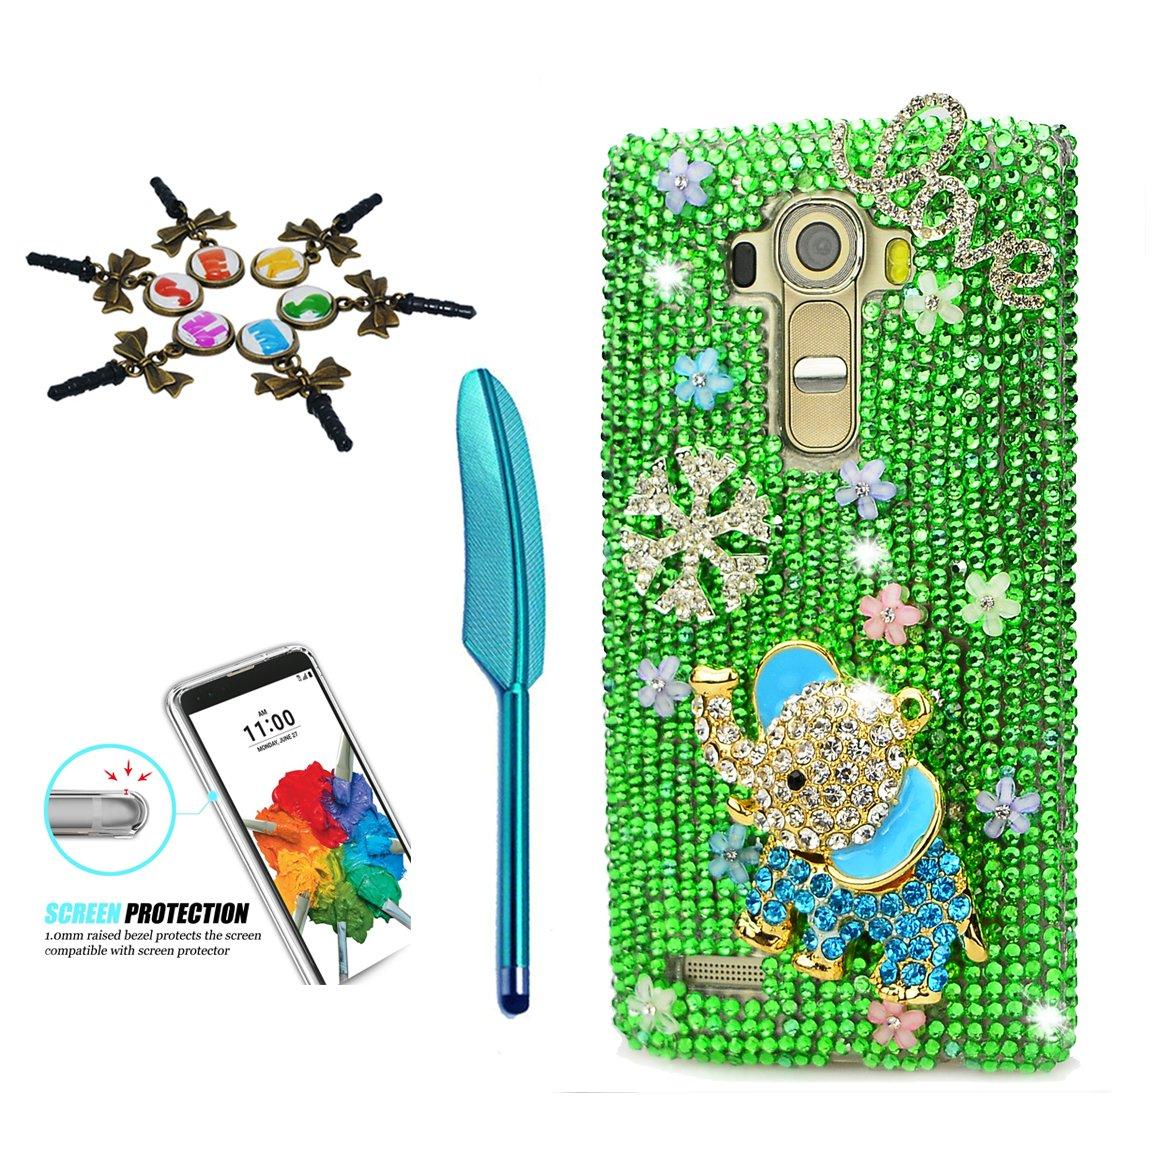 STENES LG Stylo 3 Case - 3D Handmade Crystal Sparkle Diamond Rhinestone Hybrid Cover for LG Stylo 3/Stylo 3 Plus/LG LS777 with Retro Anti Dust Plug & Stylus Pen - Elephant Snow Love Flowers/Green